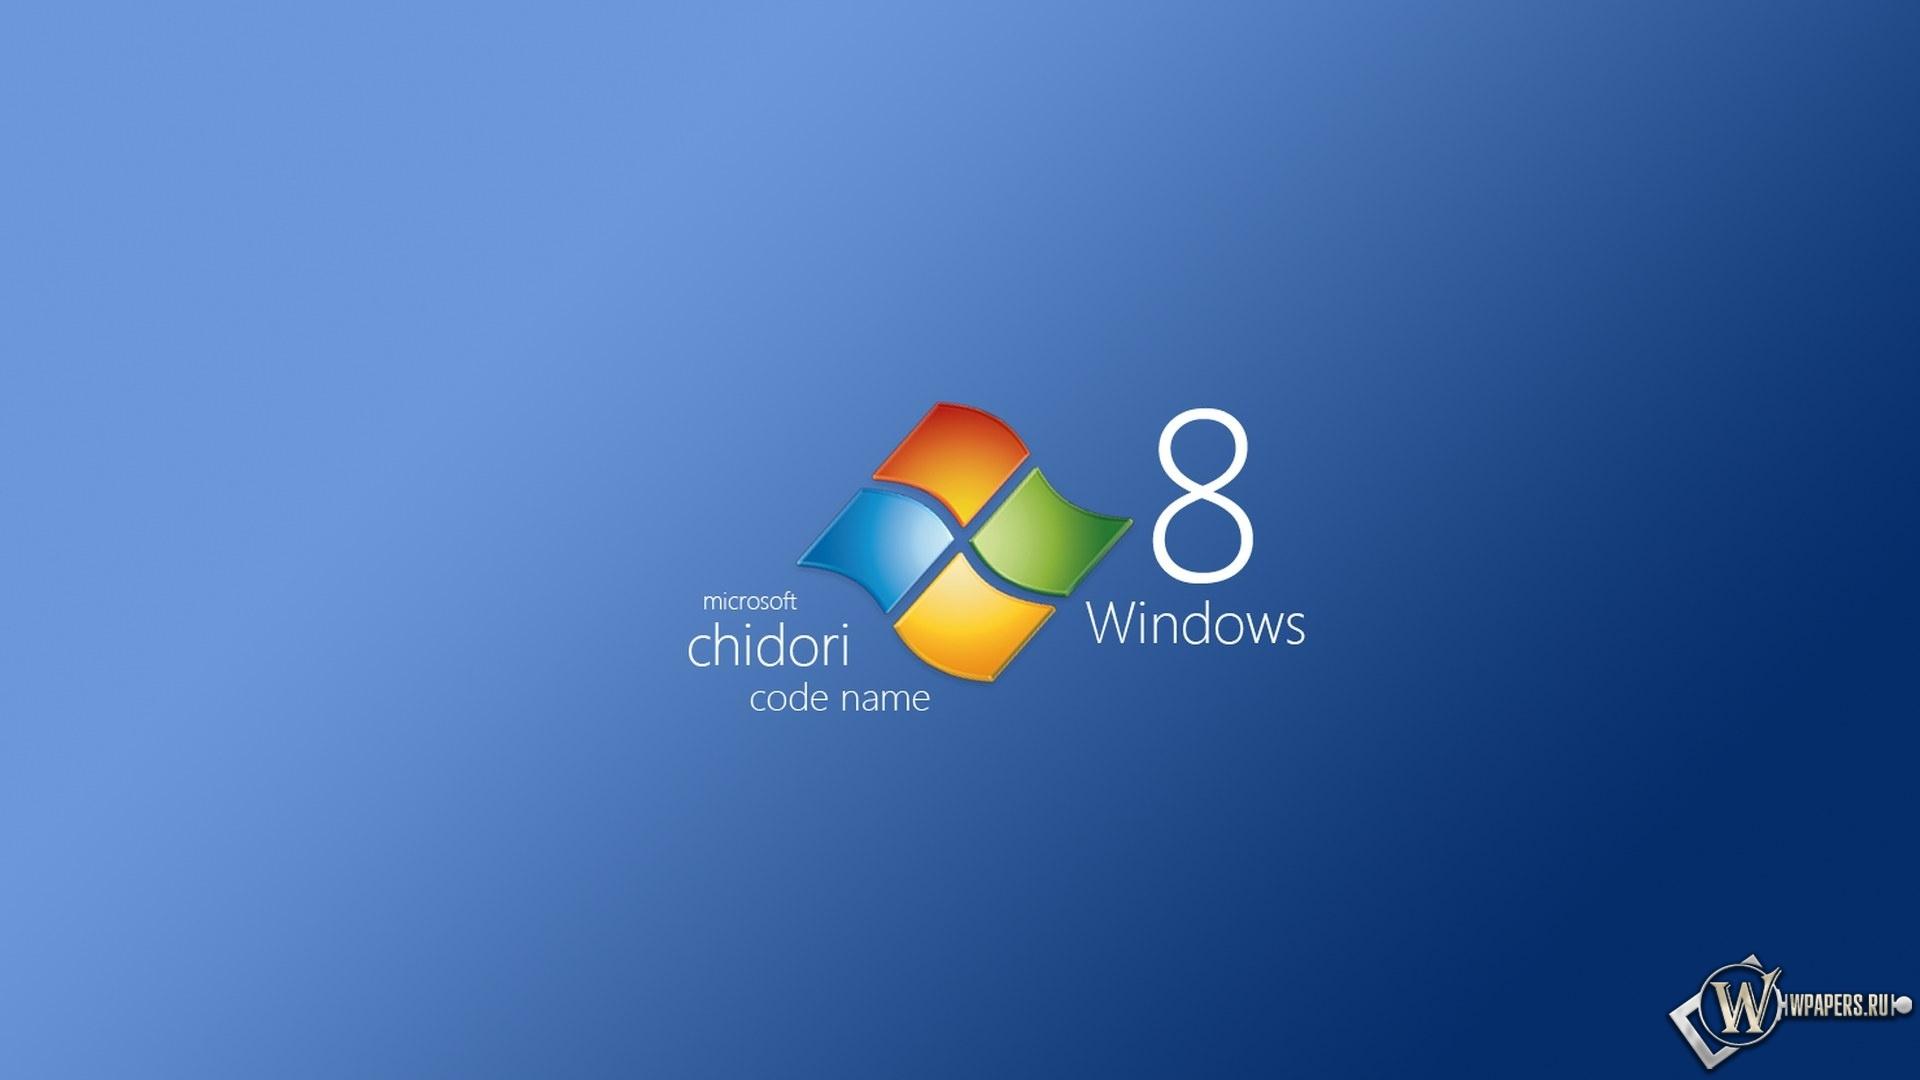 Windows 8 chidori 1920x1080